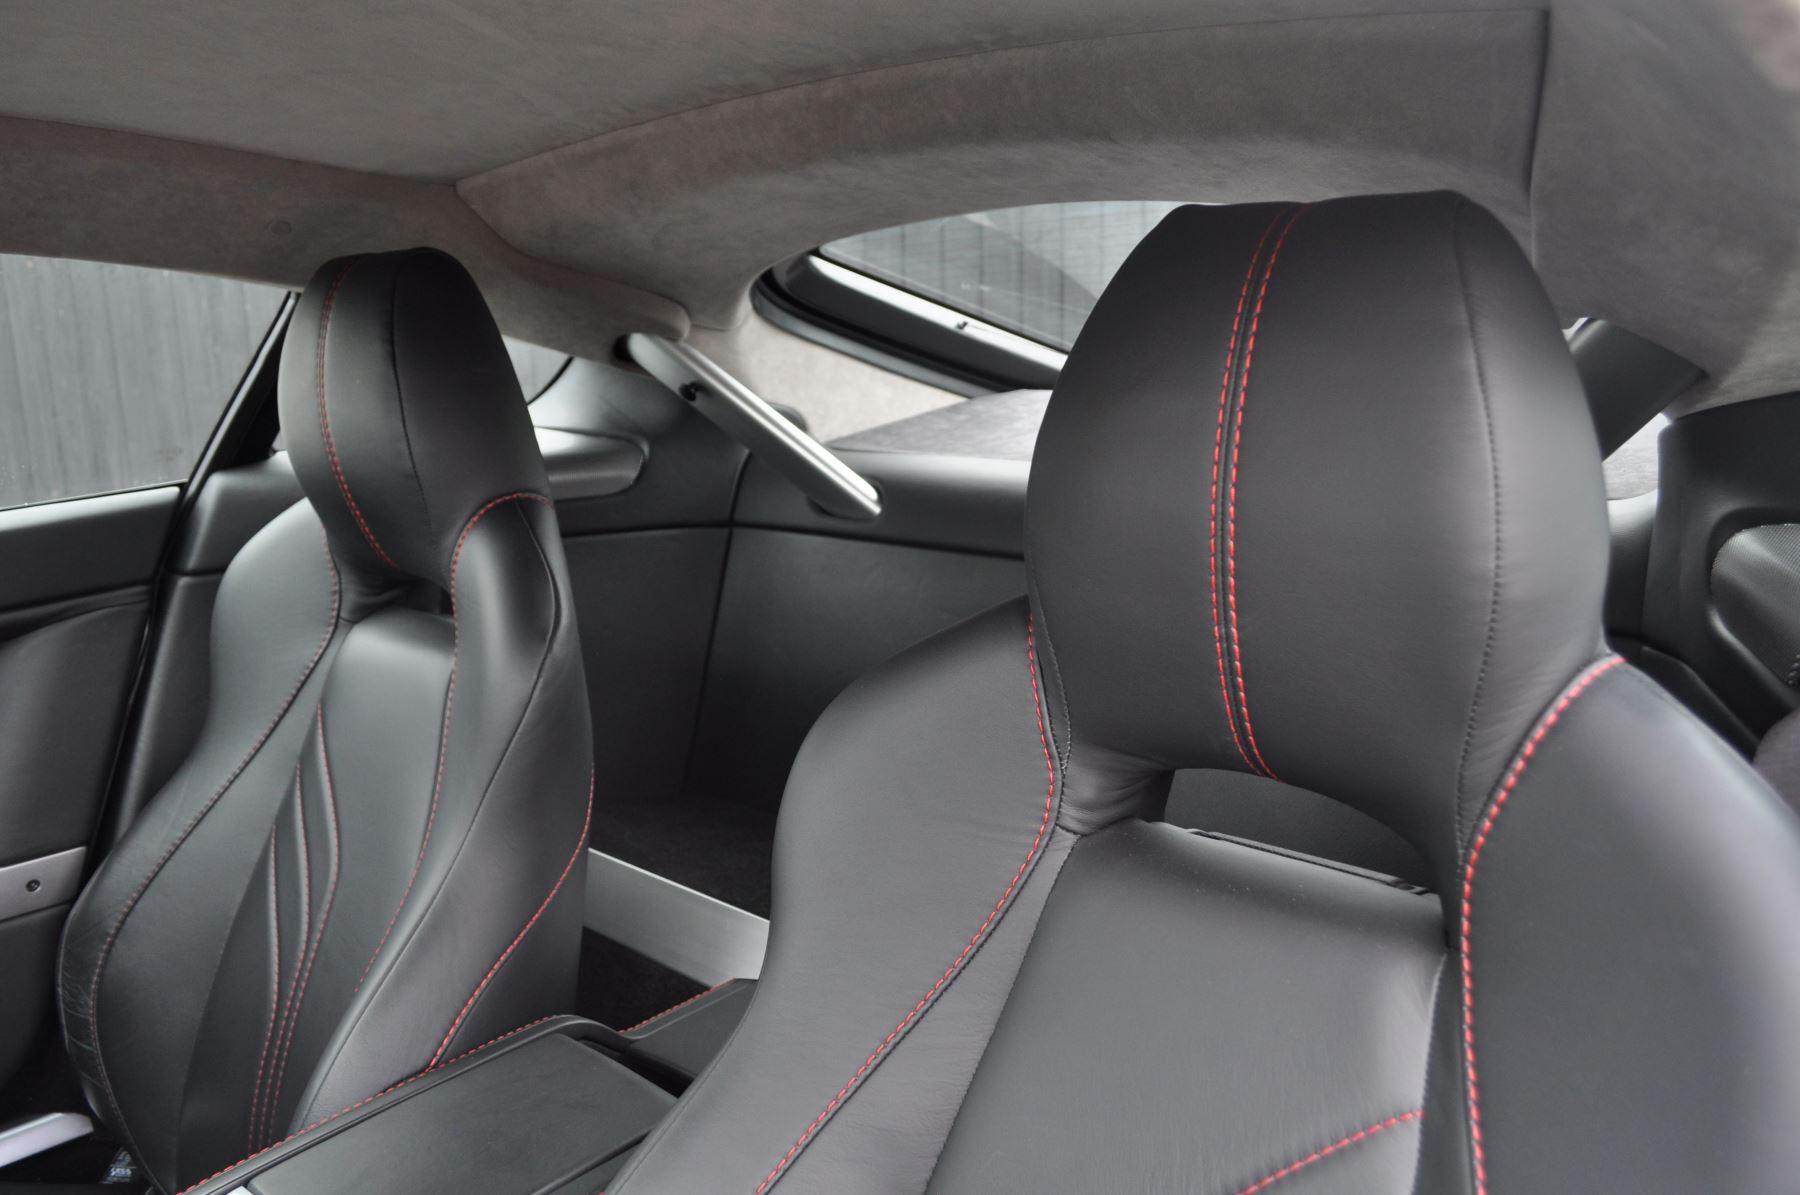 Aston Martin V8 Vantage S Coupe Coupe image 28